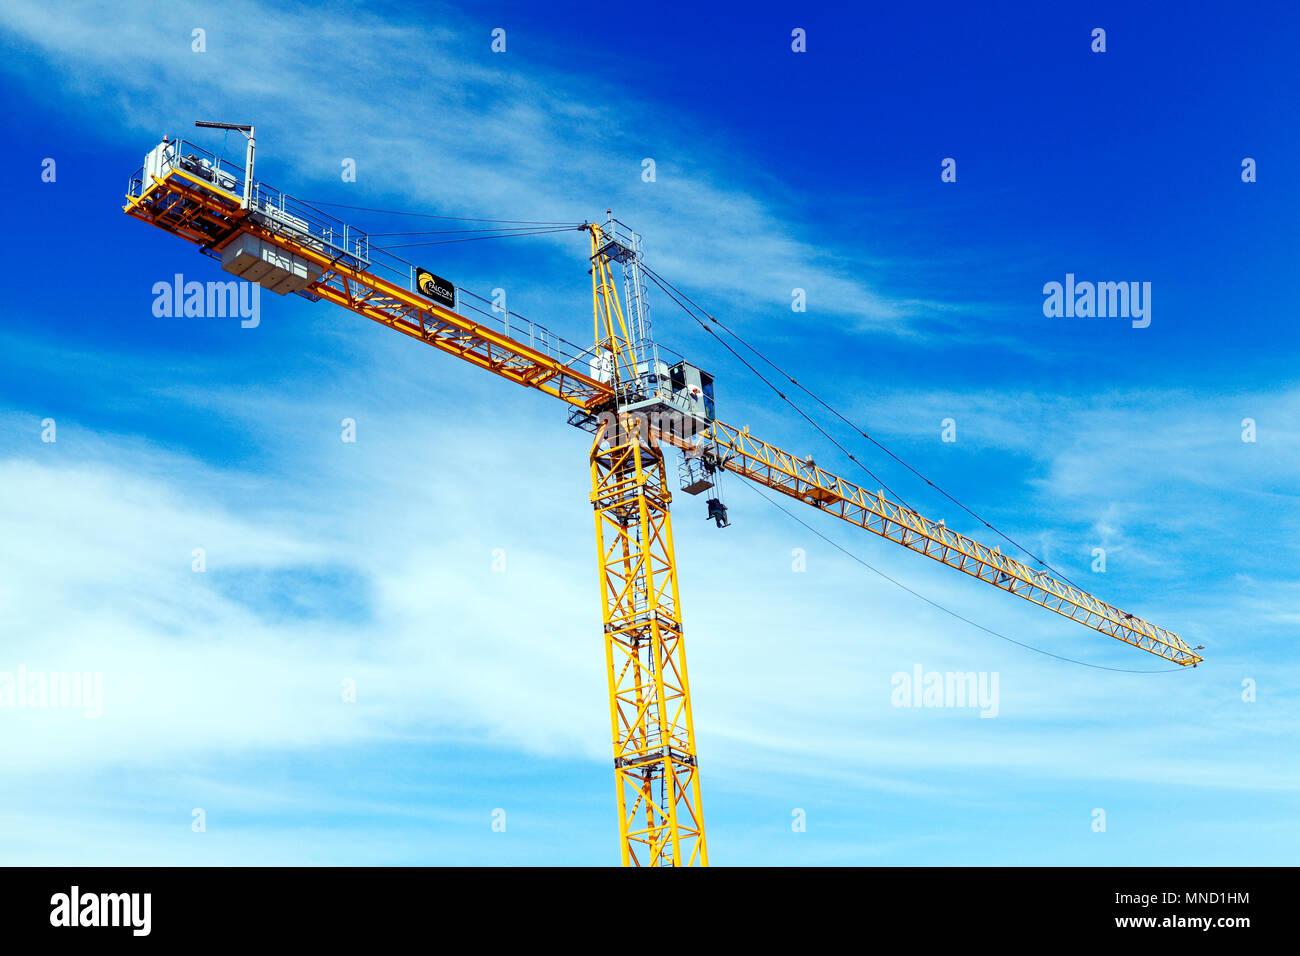 Falcon Tower Crane Services, construction crane, building site, Hunstanton, Norfolk, UK, England, detail, building, industry - Stock Image